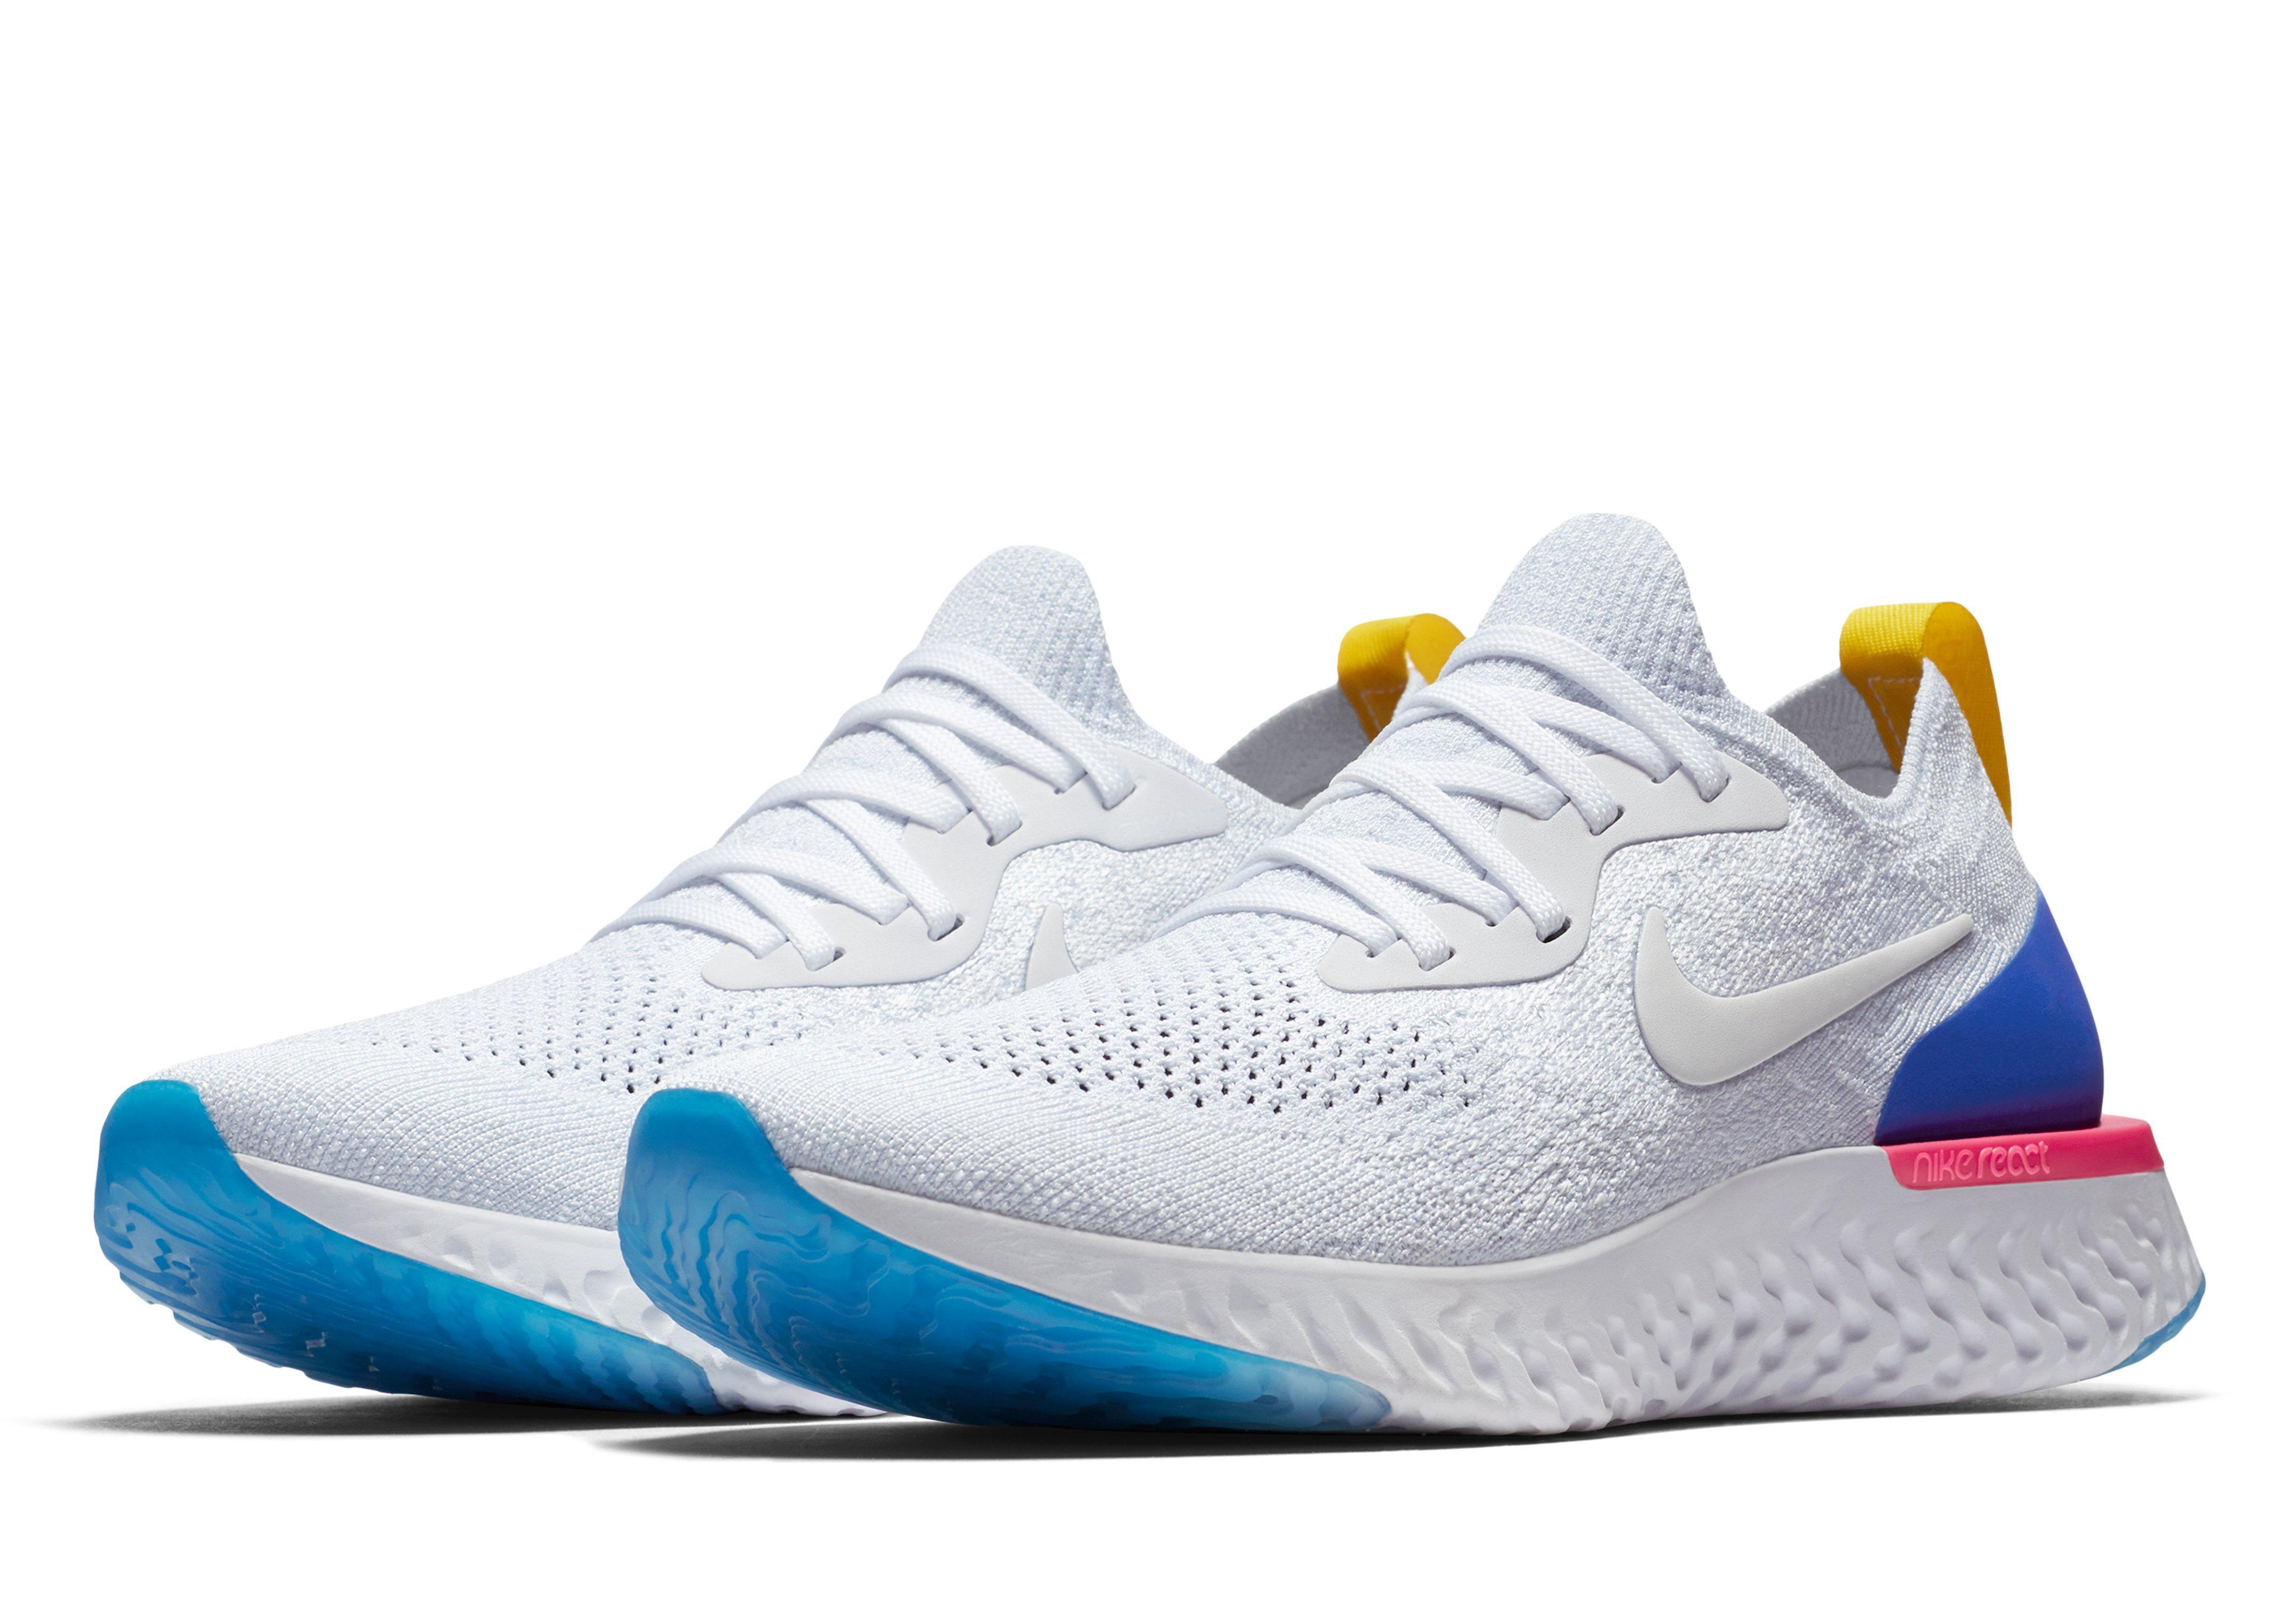 4b50e185d27e Nike Epic React Flyknit Running Shoes in Blue - Lyst